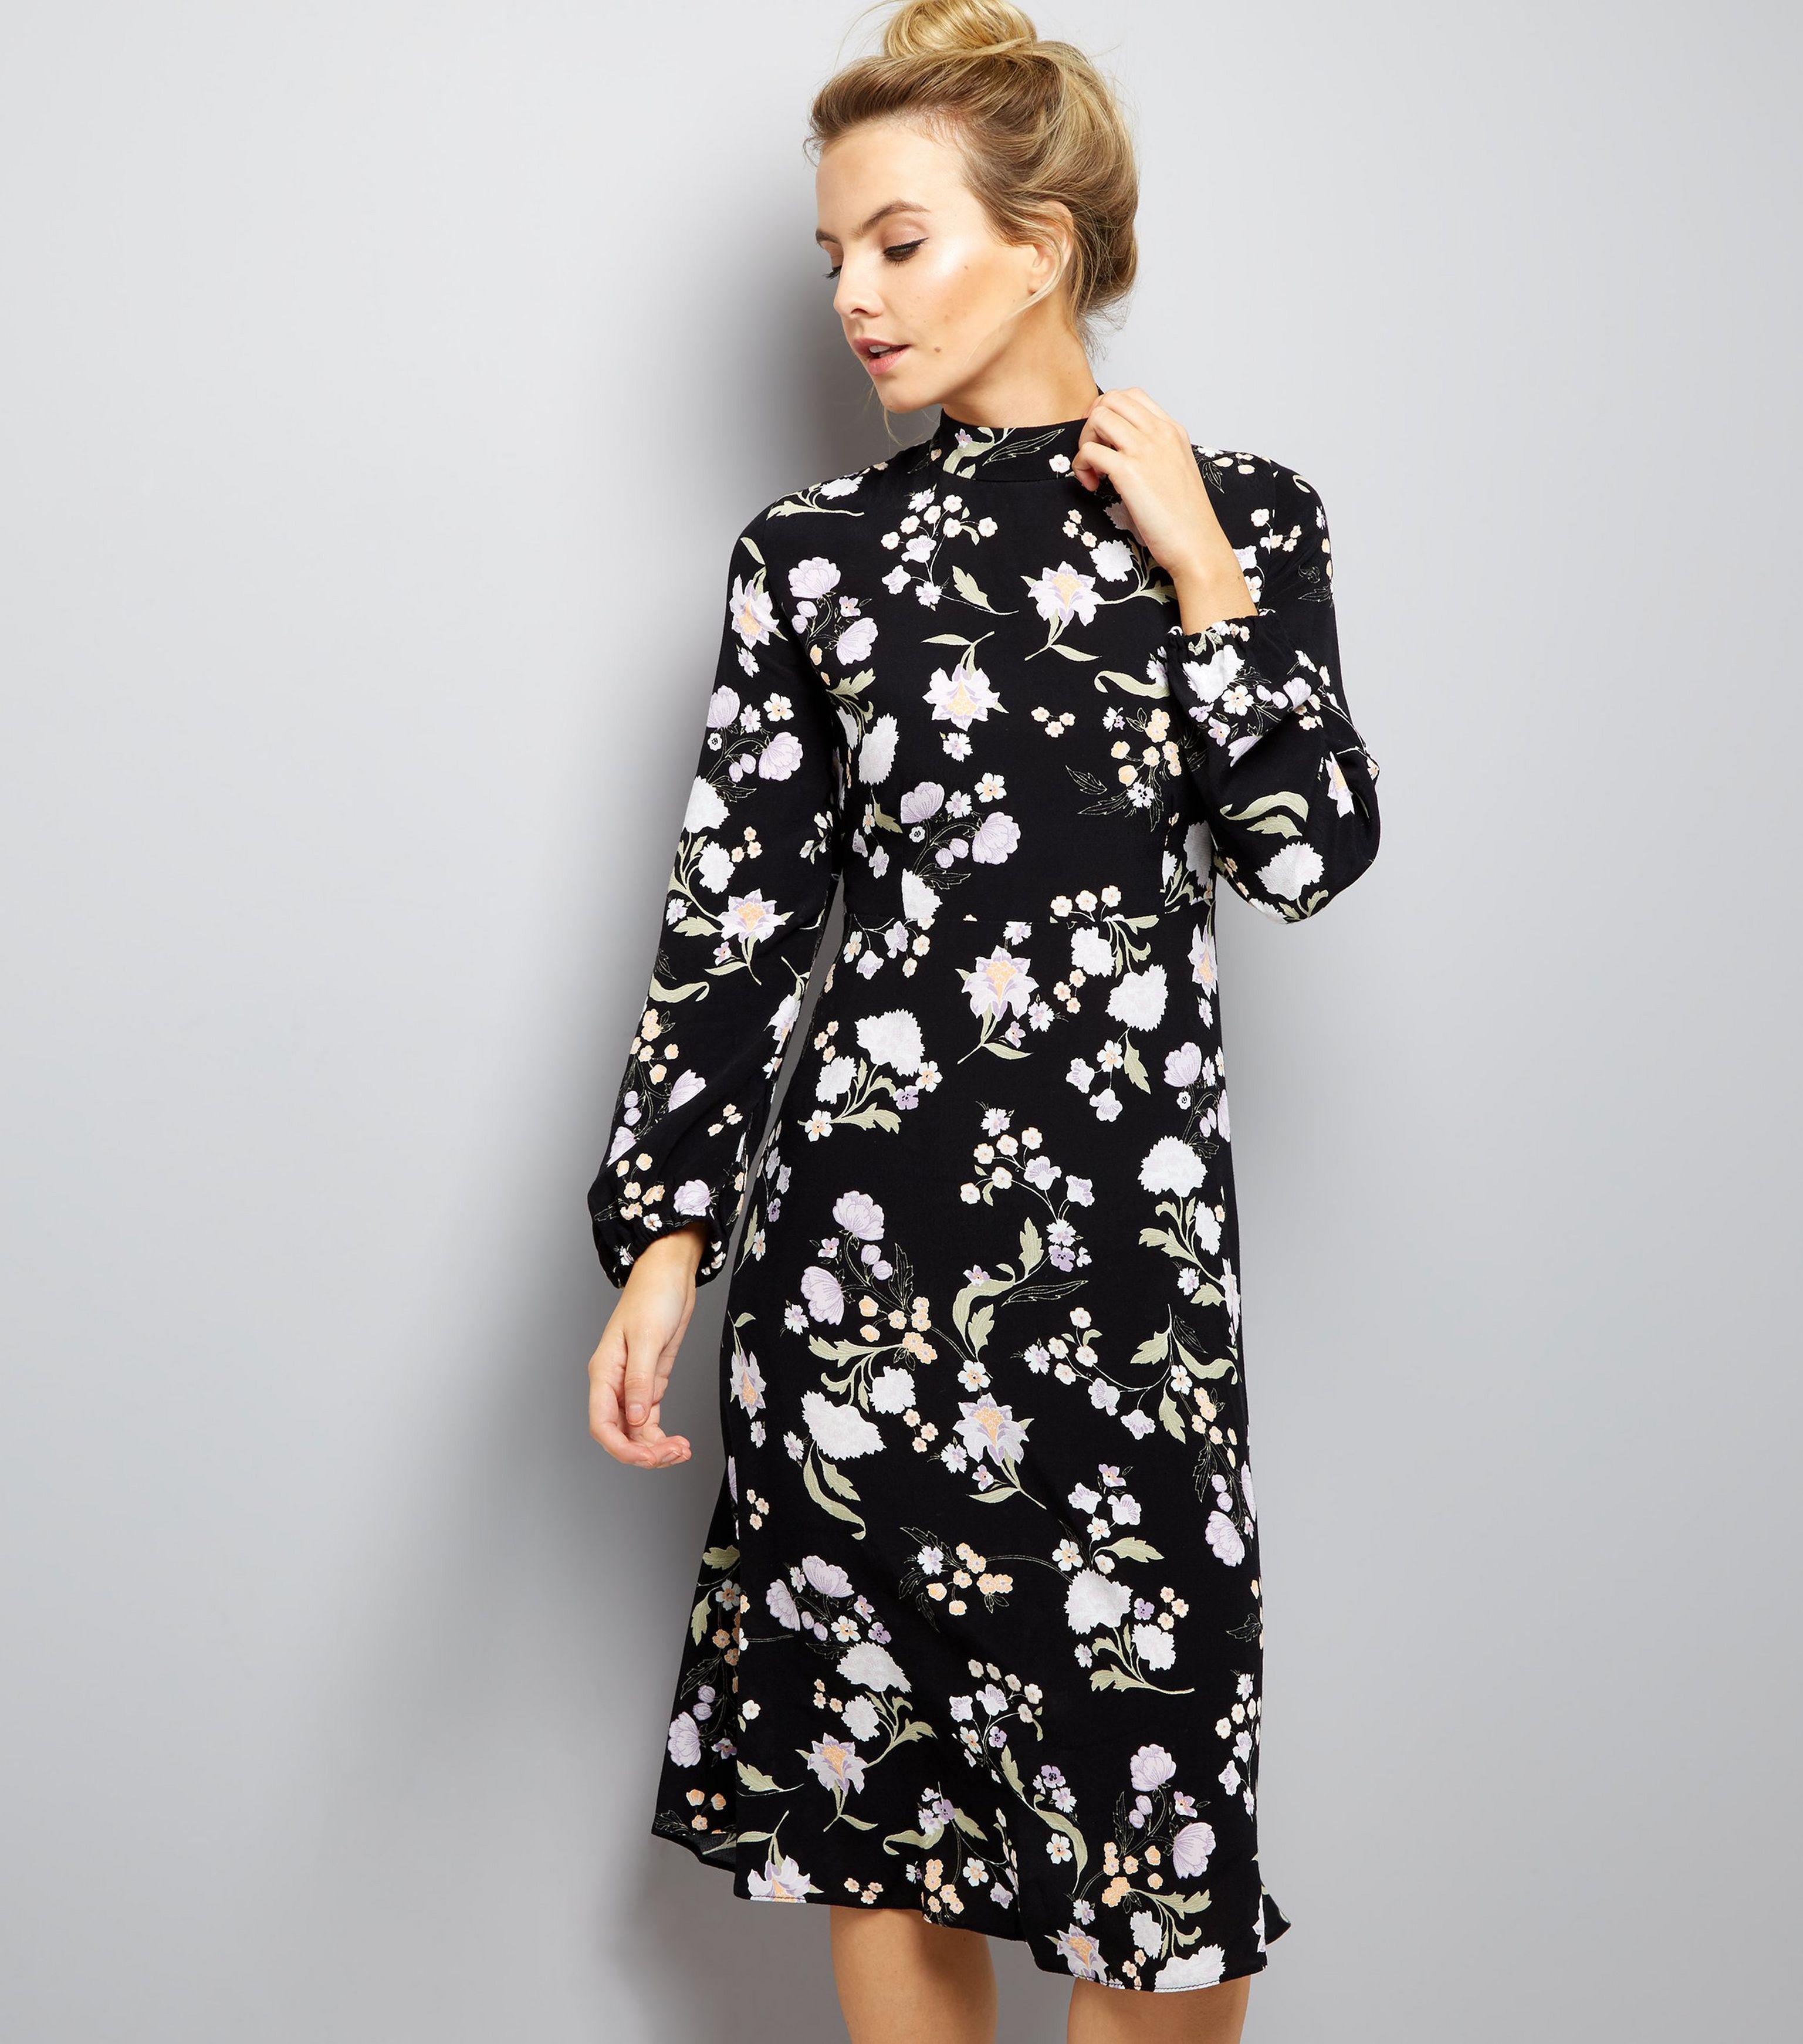 aef66740b2 New Look Petite Black Floral Funnel Neck Midi Dress in Black - Lyst